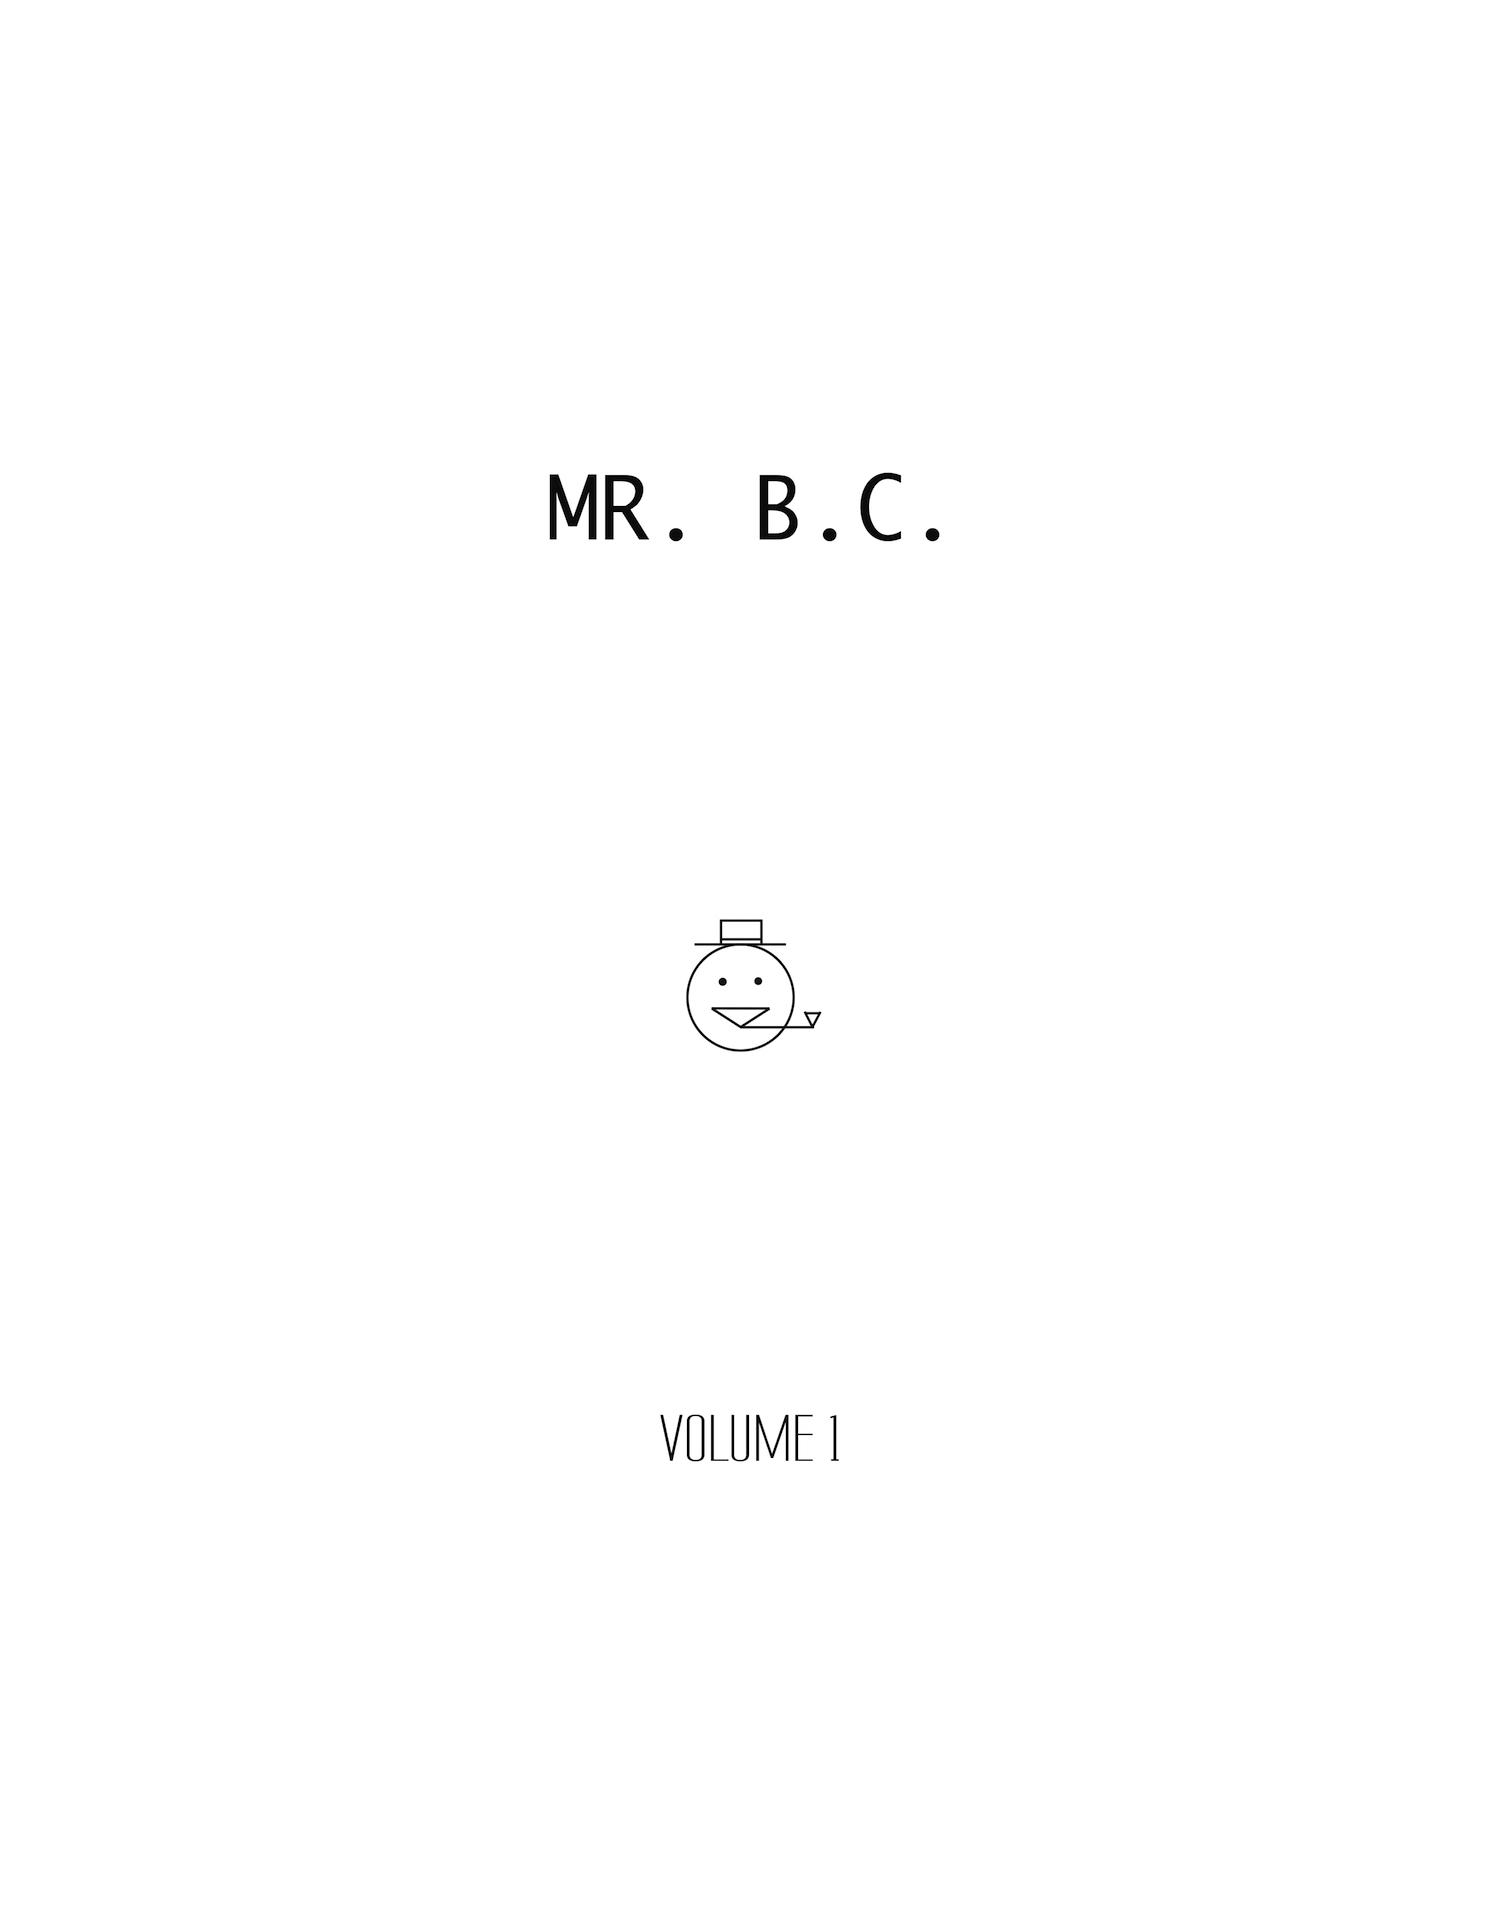 MR BC FINAL- BOOK NAME PAGE copy copy.jpg